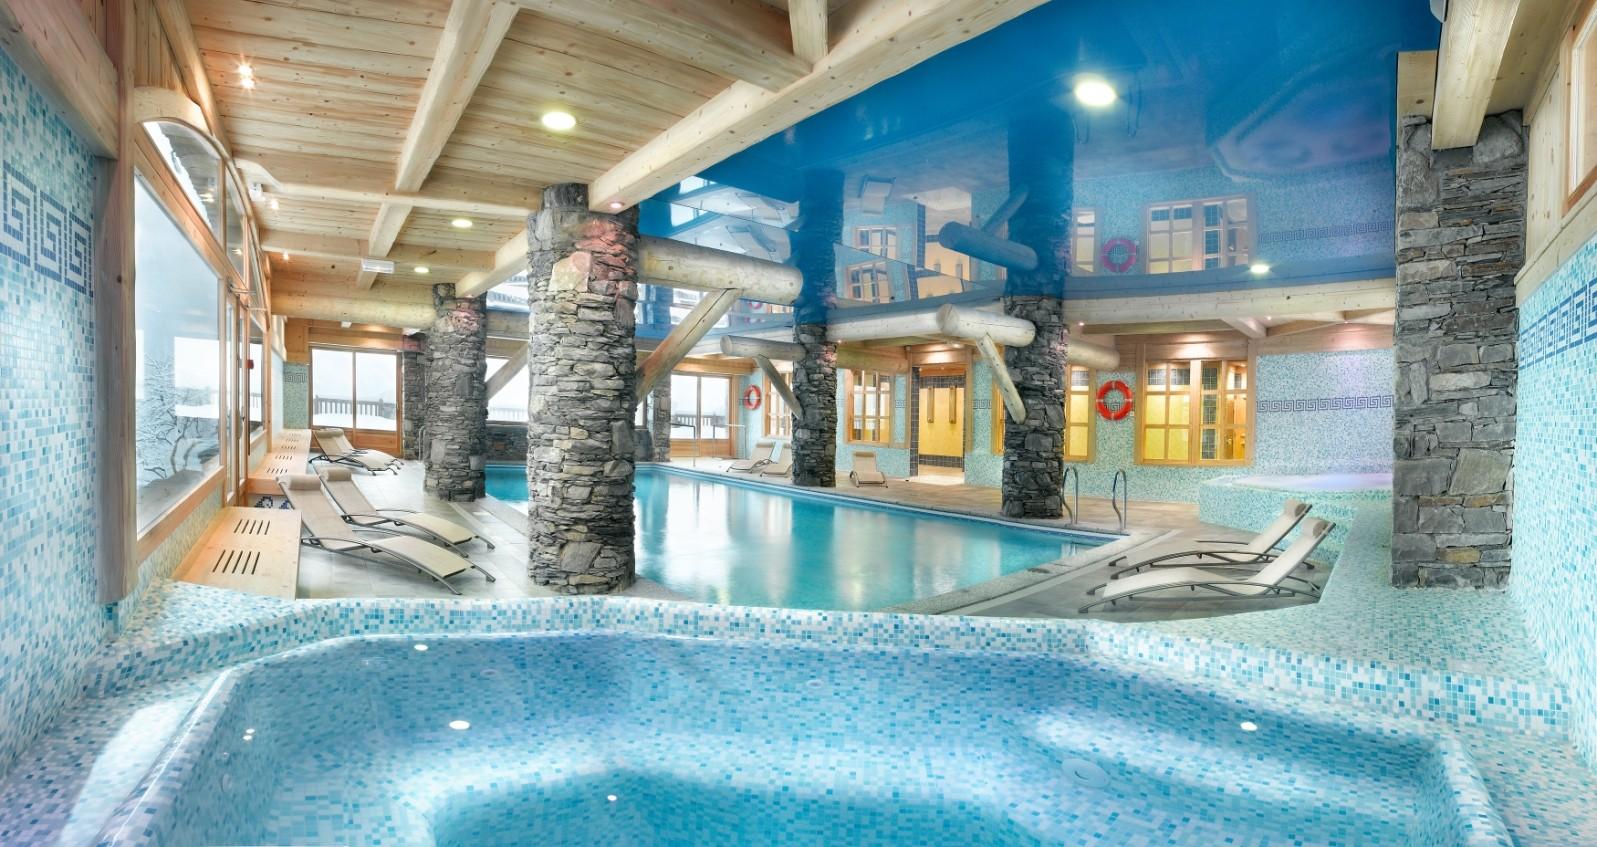 sainte-foy-tarentaise-location-appartement-luxe-love-stone-duplex